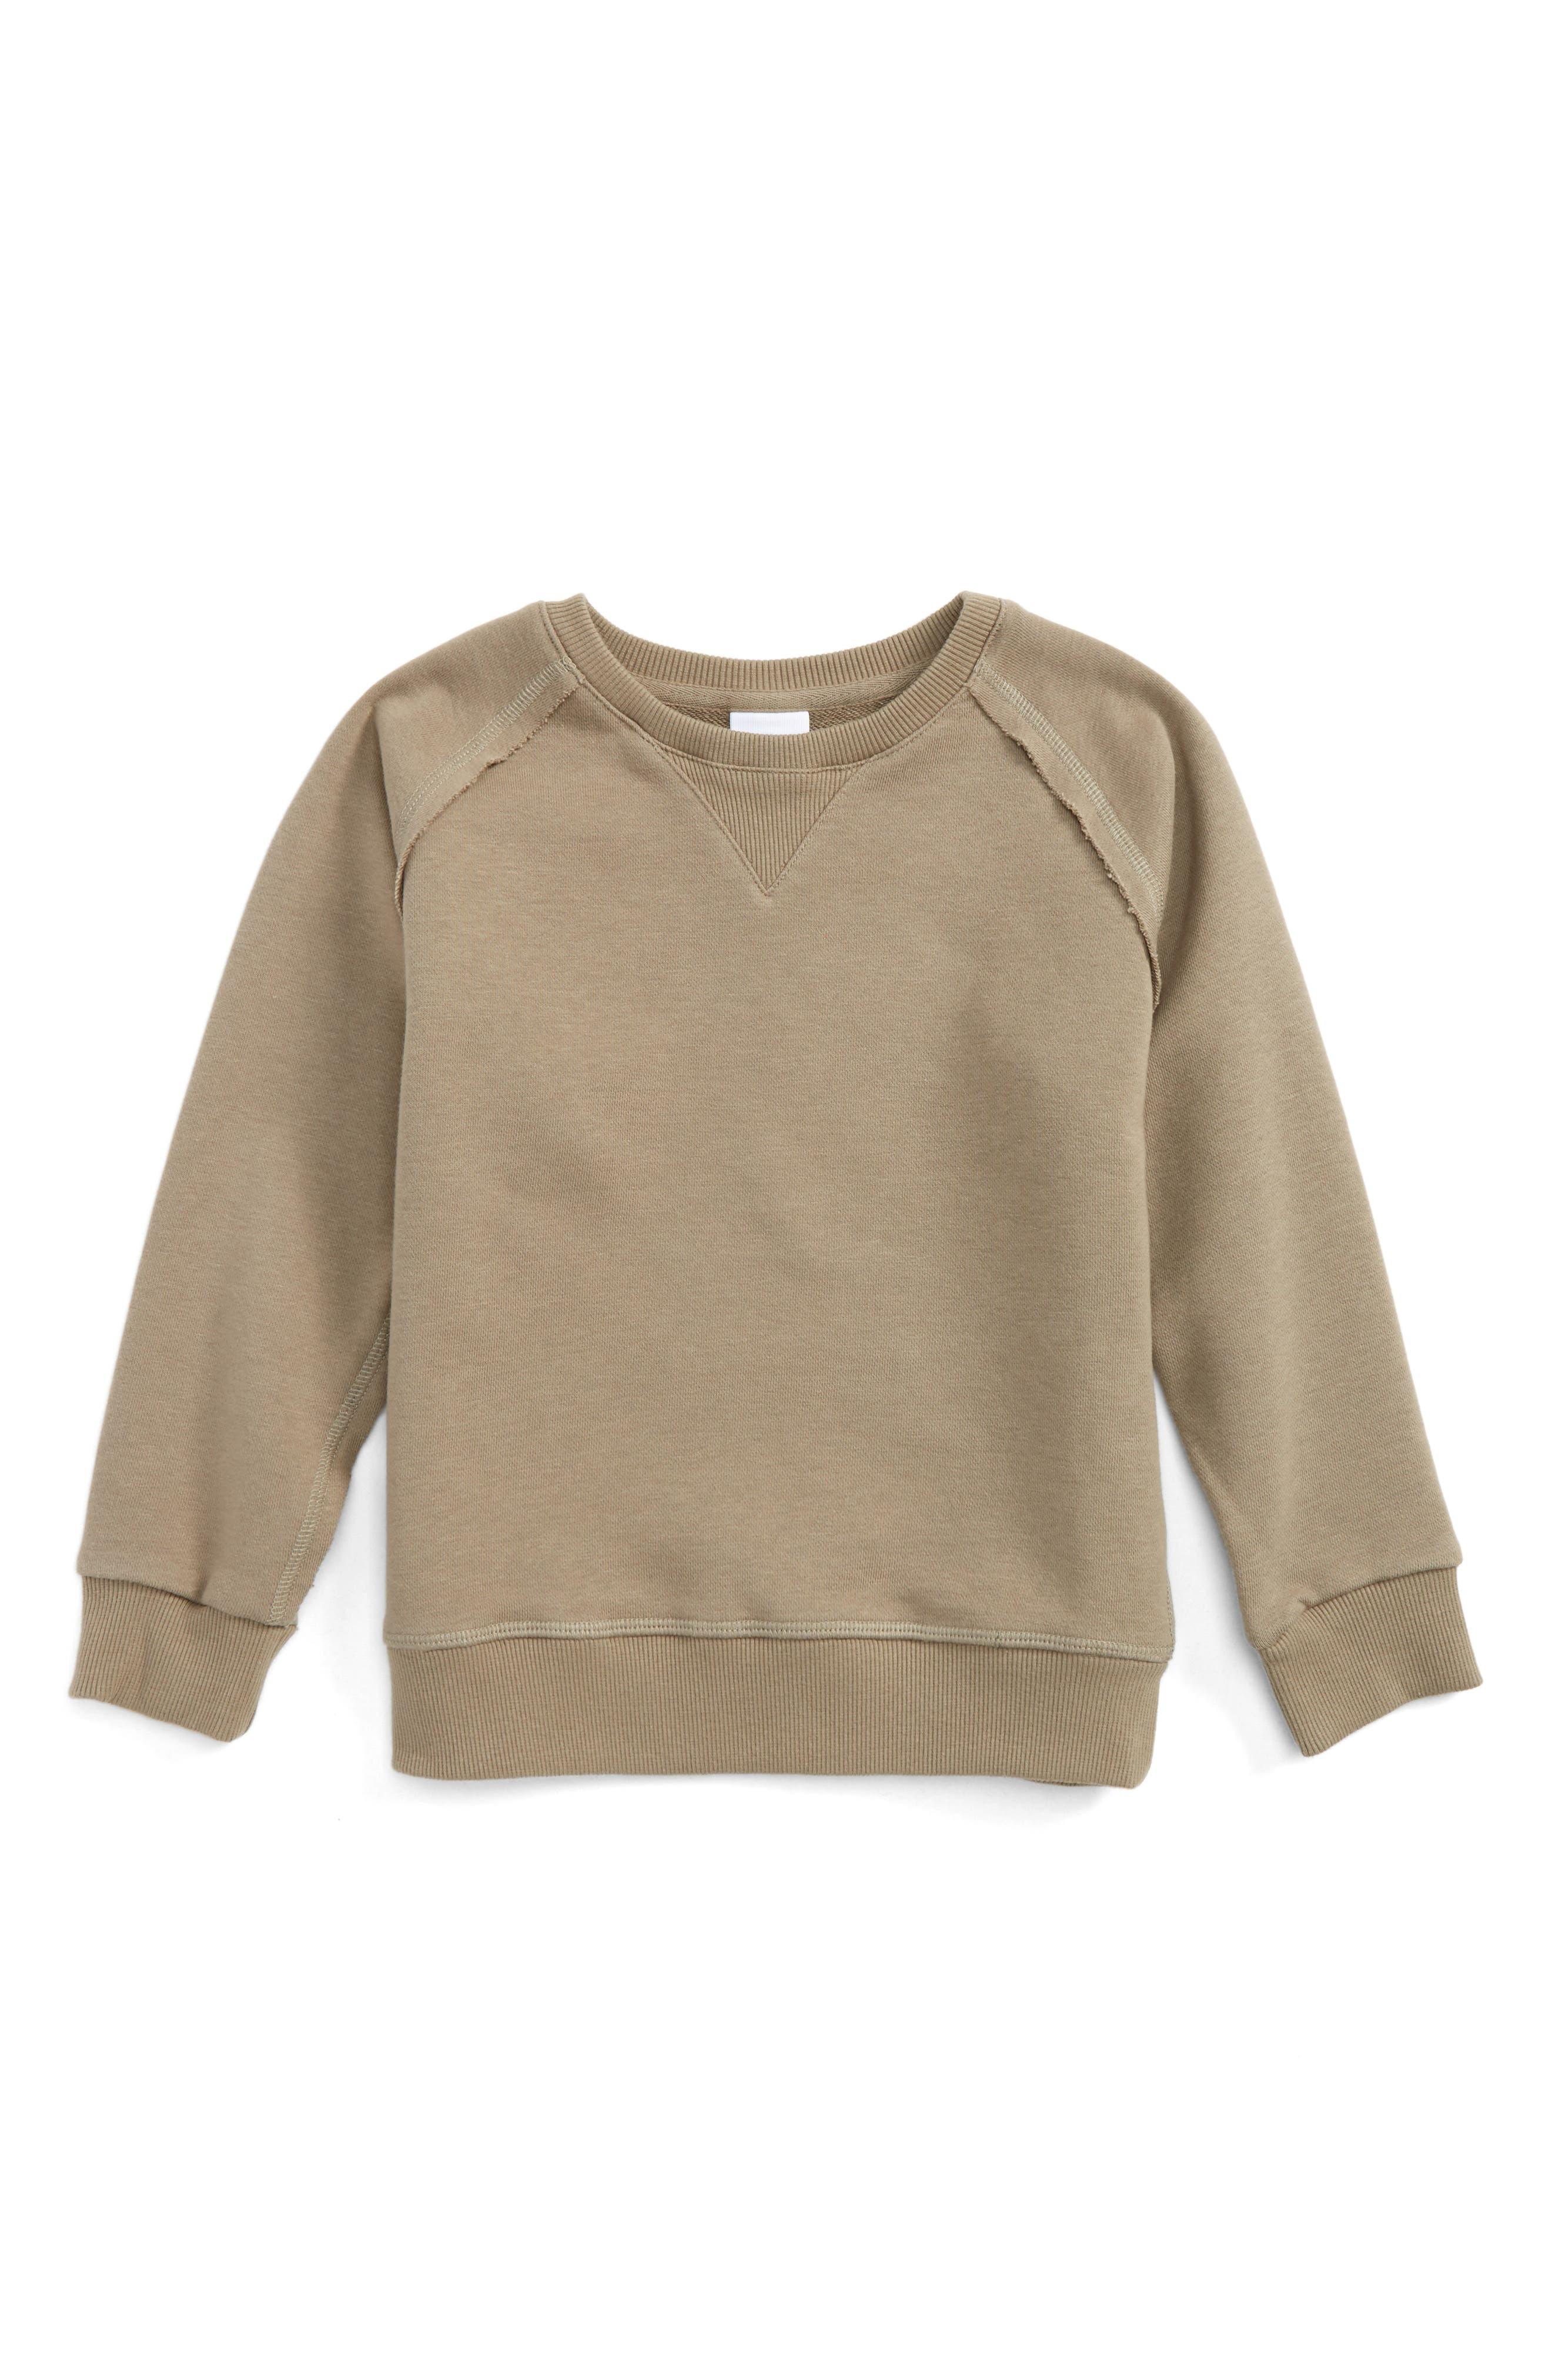 Main Image - Superism Raglan Sleeve Sweatshirt (Toddler Boys & Little Boys)